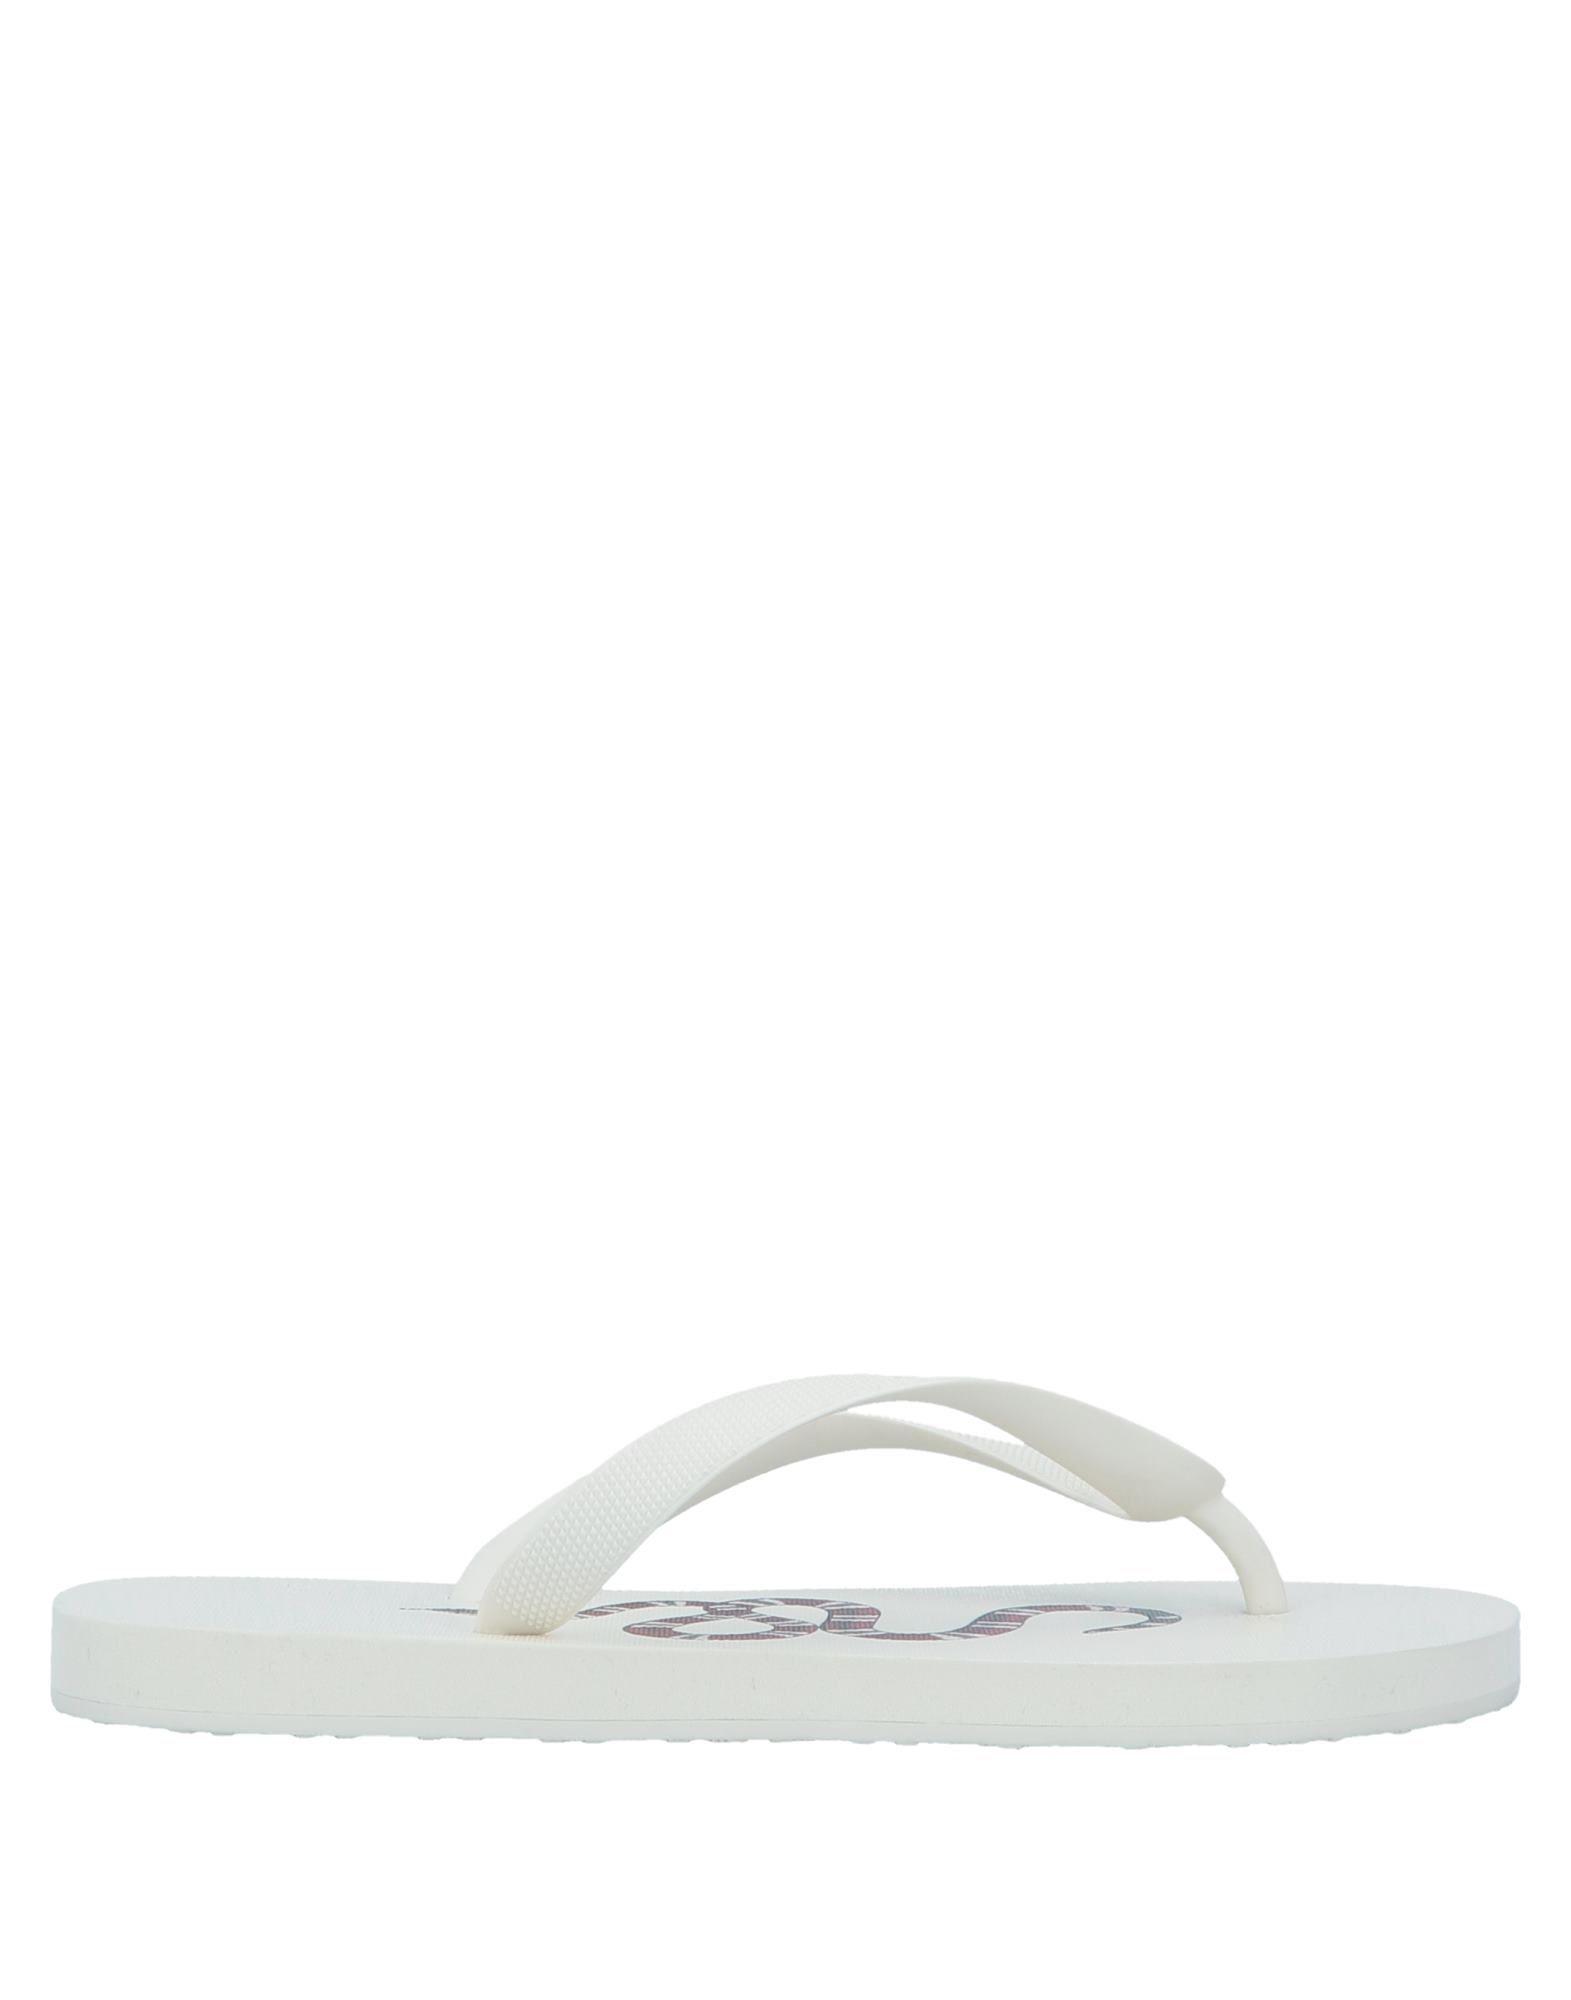 Gucci Flip Flops In White